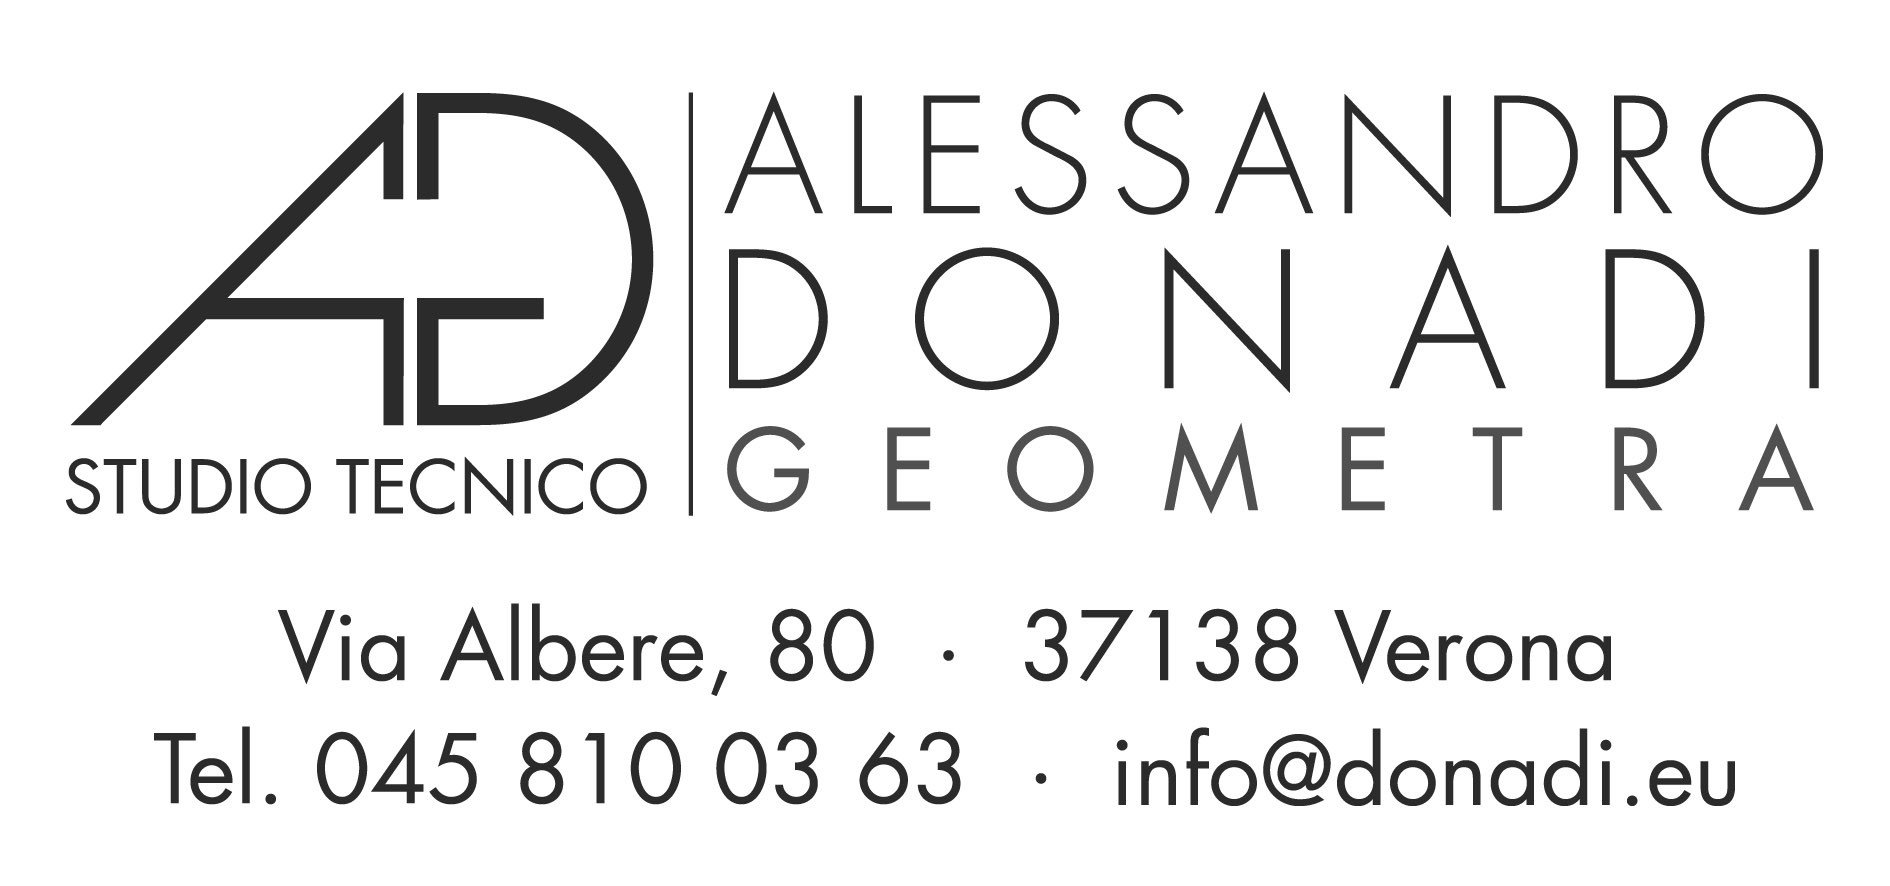 Studio Tecnico Donadi